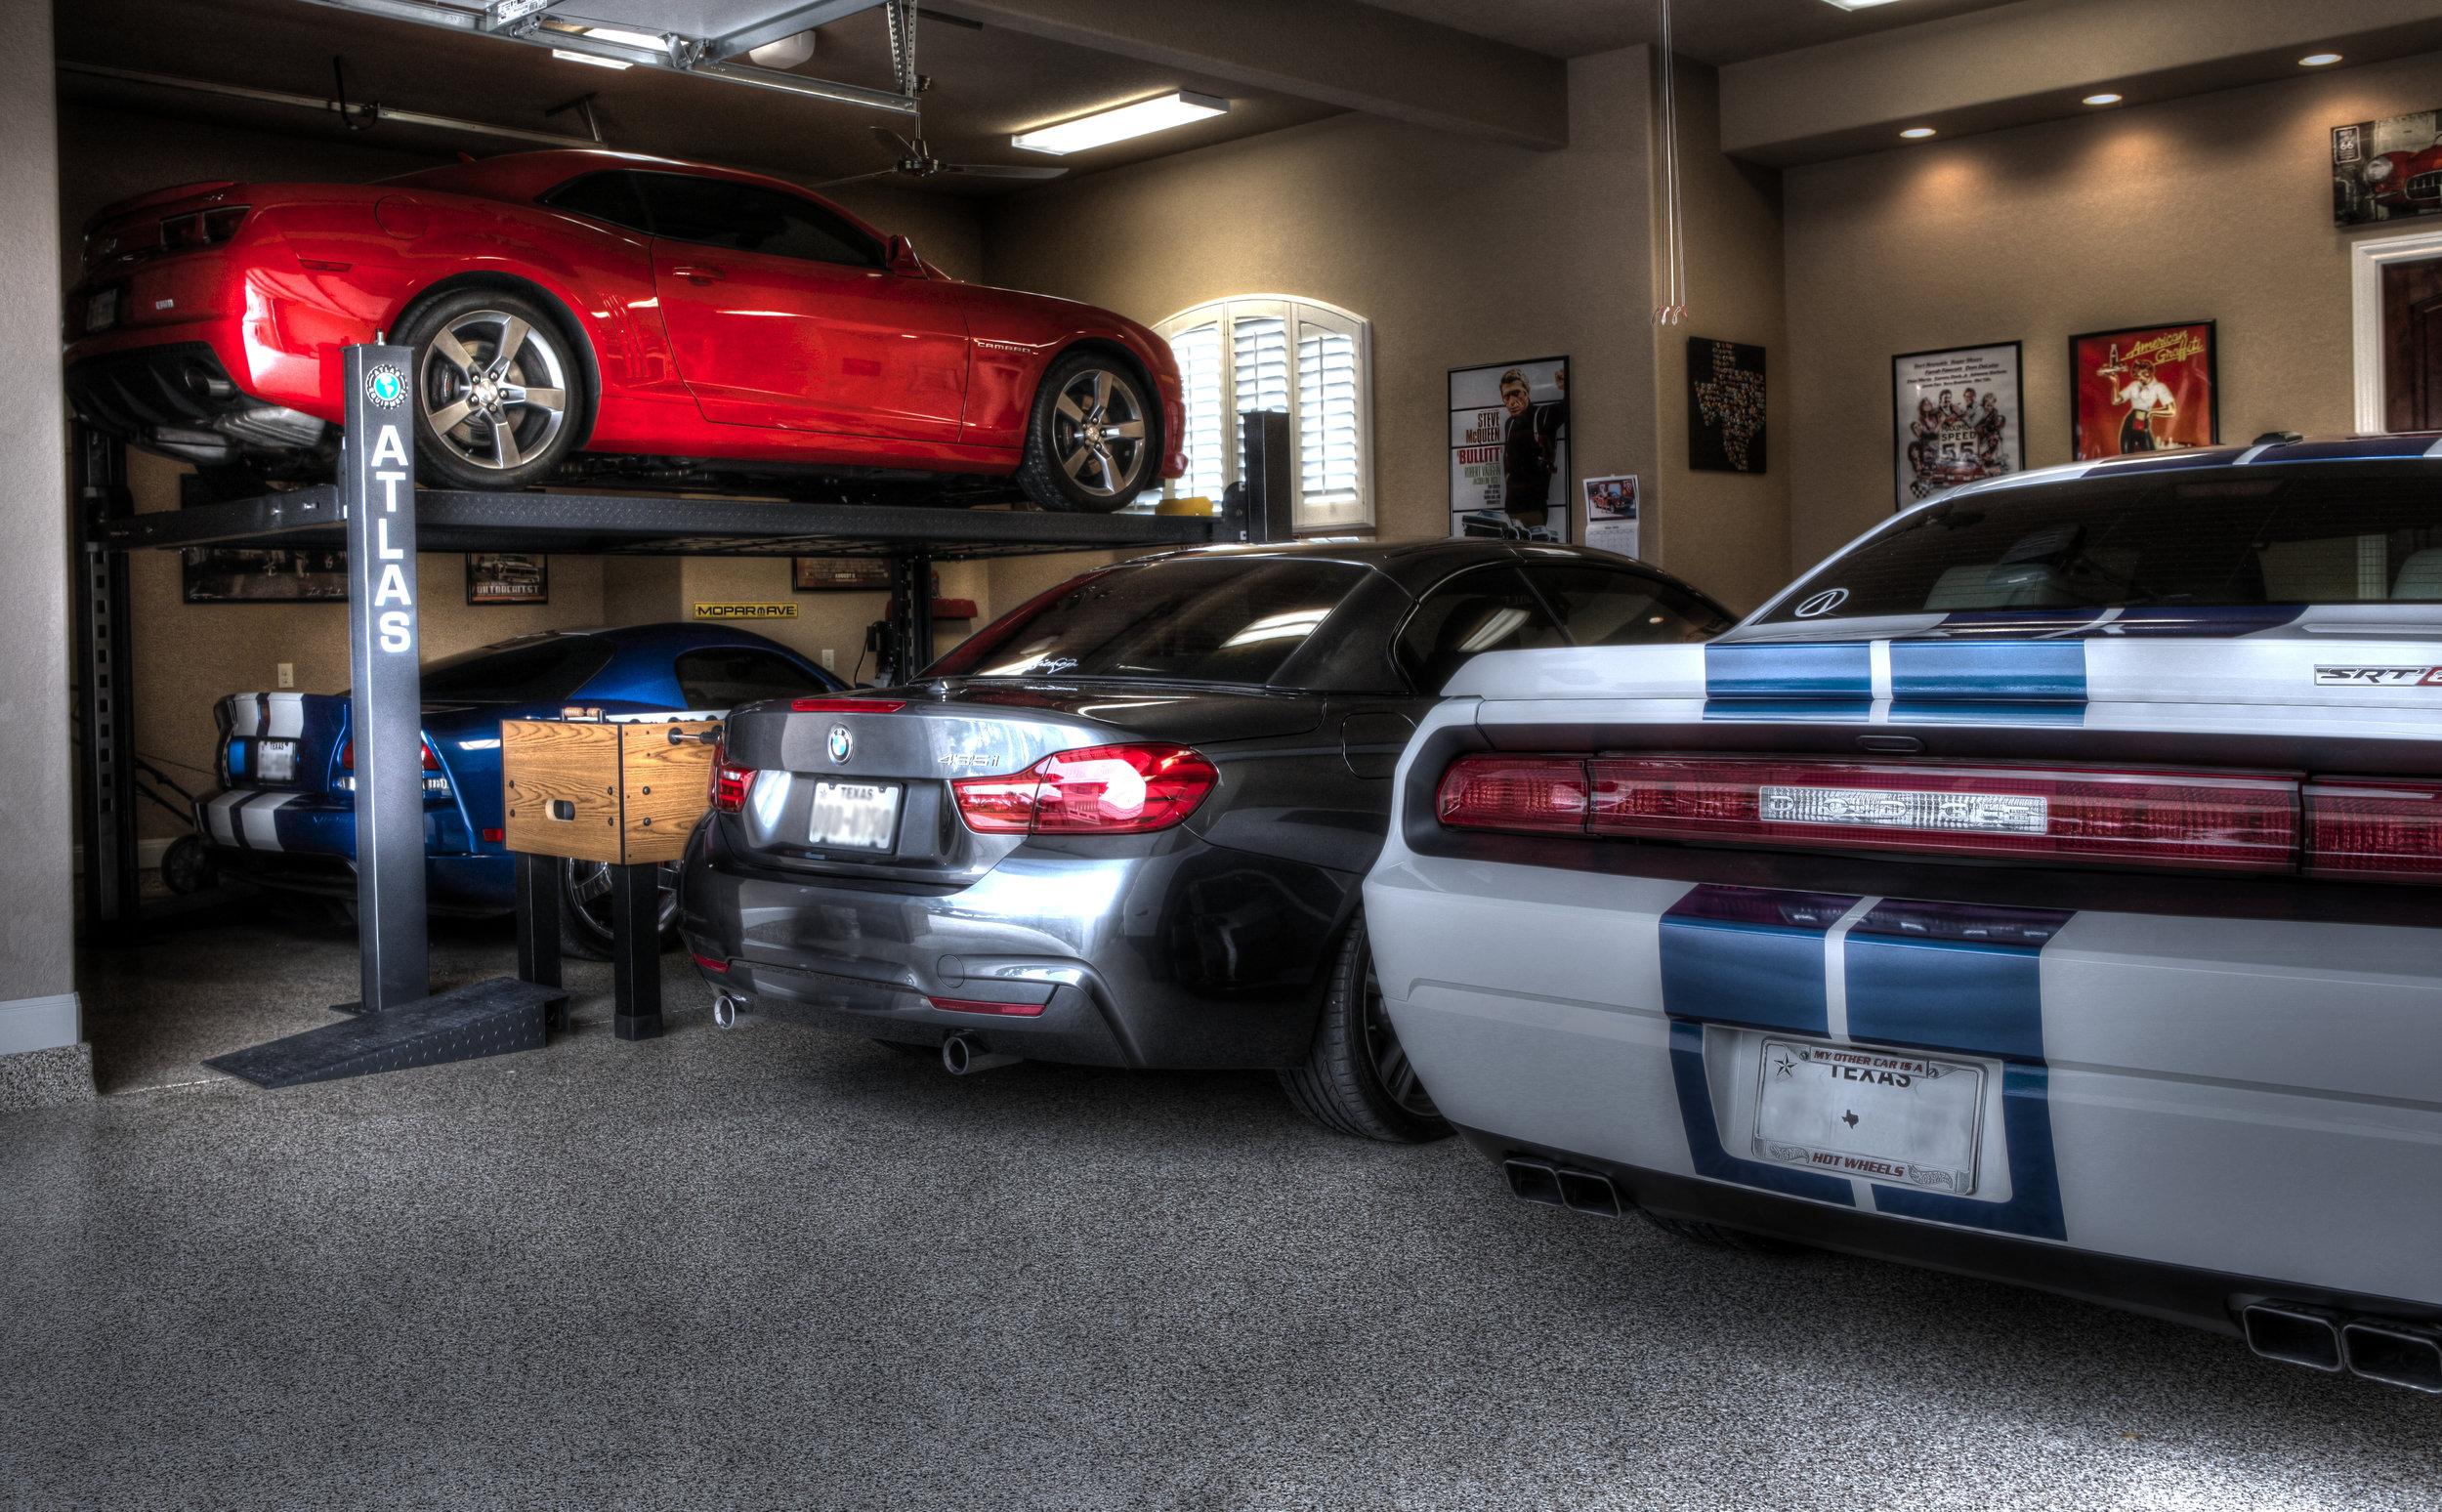 28-cars 3 - enhanced.jpg